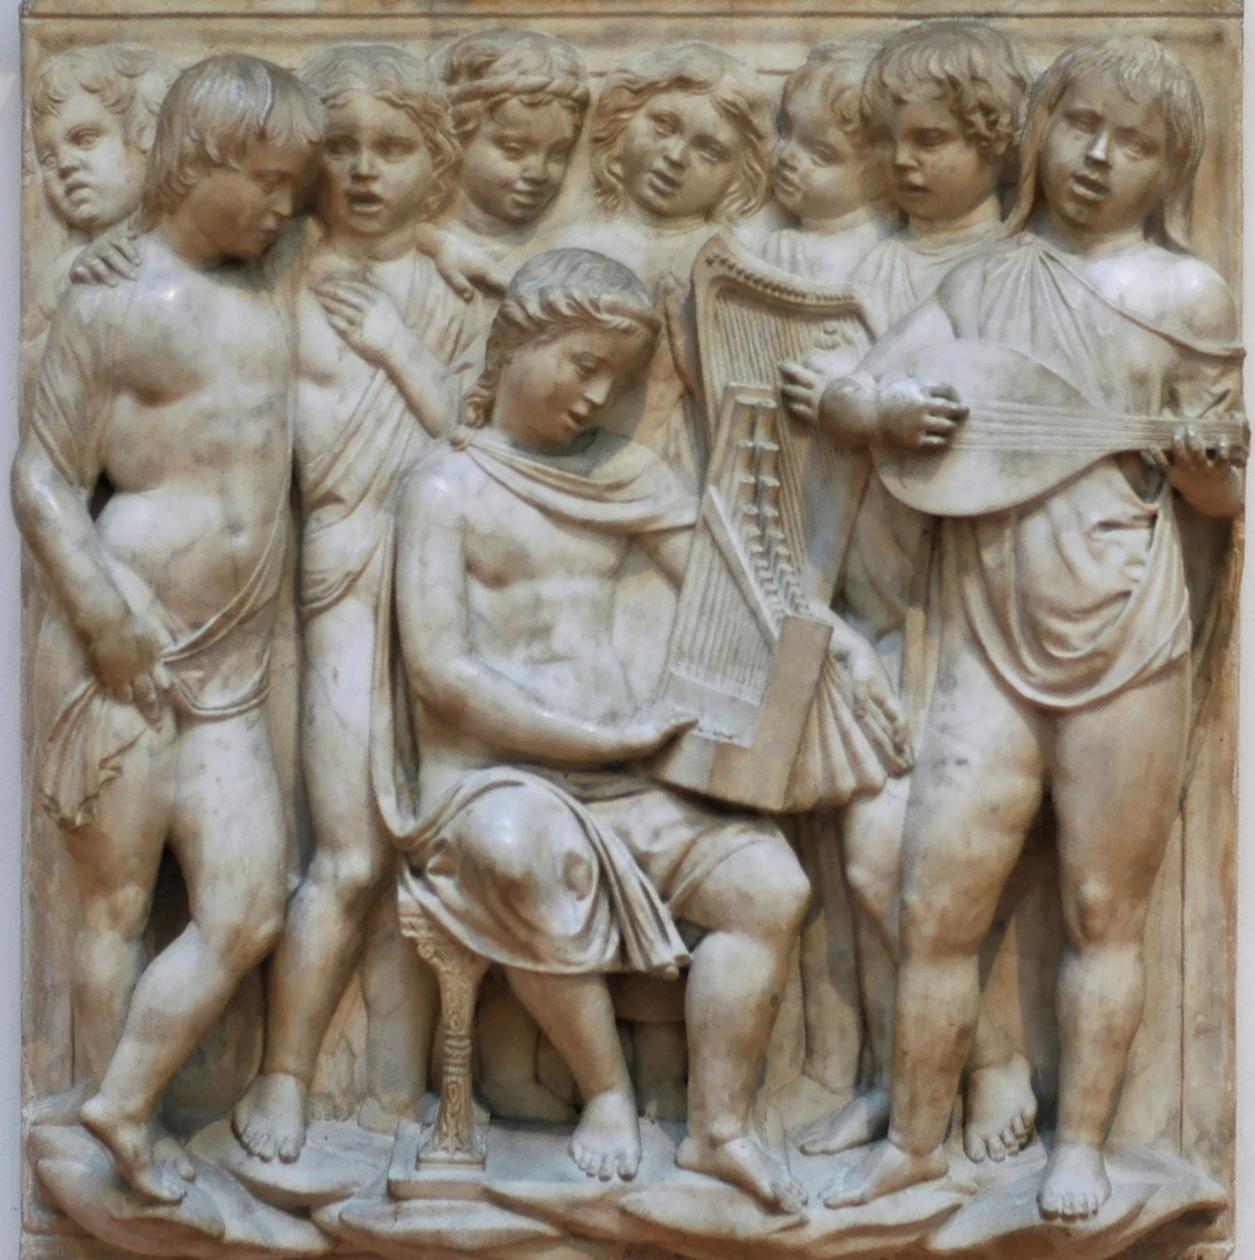 http://upload.wikimedia.org/wikipedia/commons/3/31/Cantoria_Della_Robbia_OPA_Florence_9.jpg